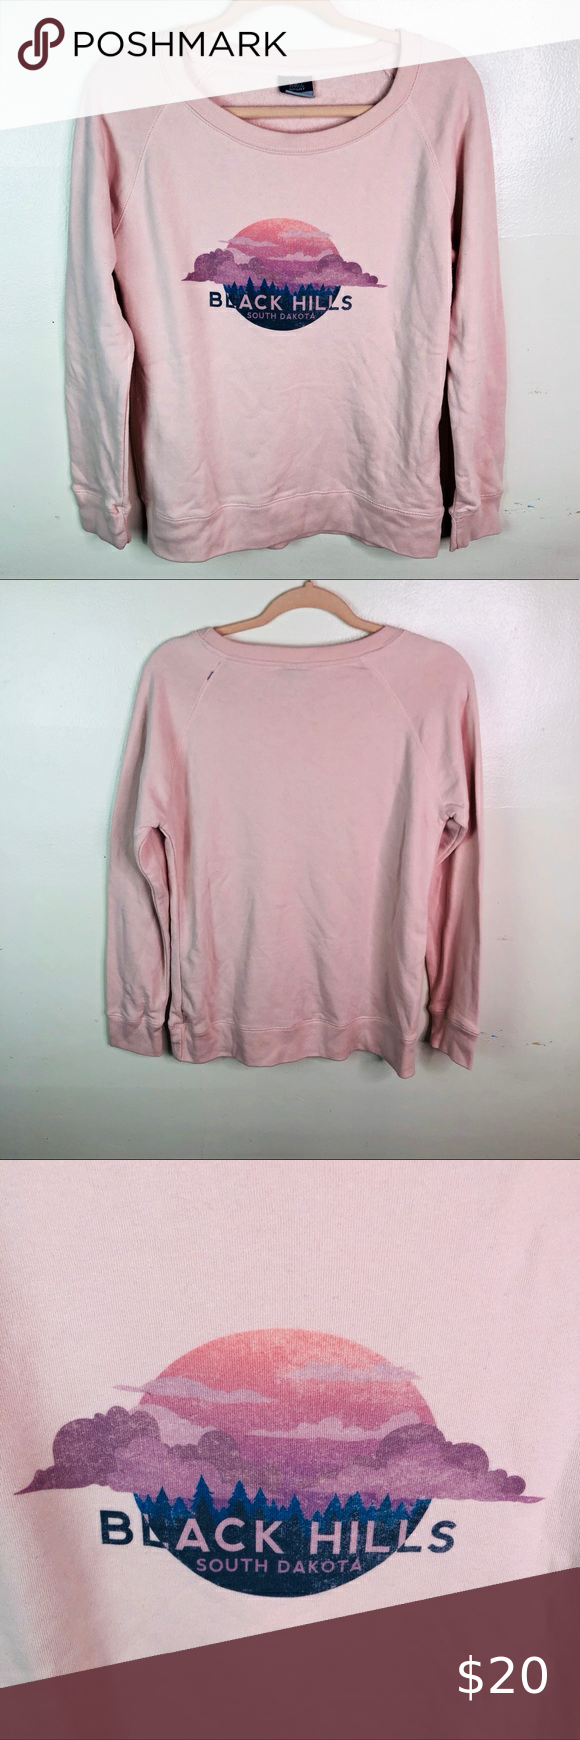 Mv Sport Pink Graphic Sweatshirt South Dakota M Mv Sport Pink Graphic Sweatshirt South Dakota Size Medium Supe Sweatshirts Sweatshirt Tops Graphic Sweatshirt [ 1740 x 580 Pixel ]